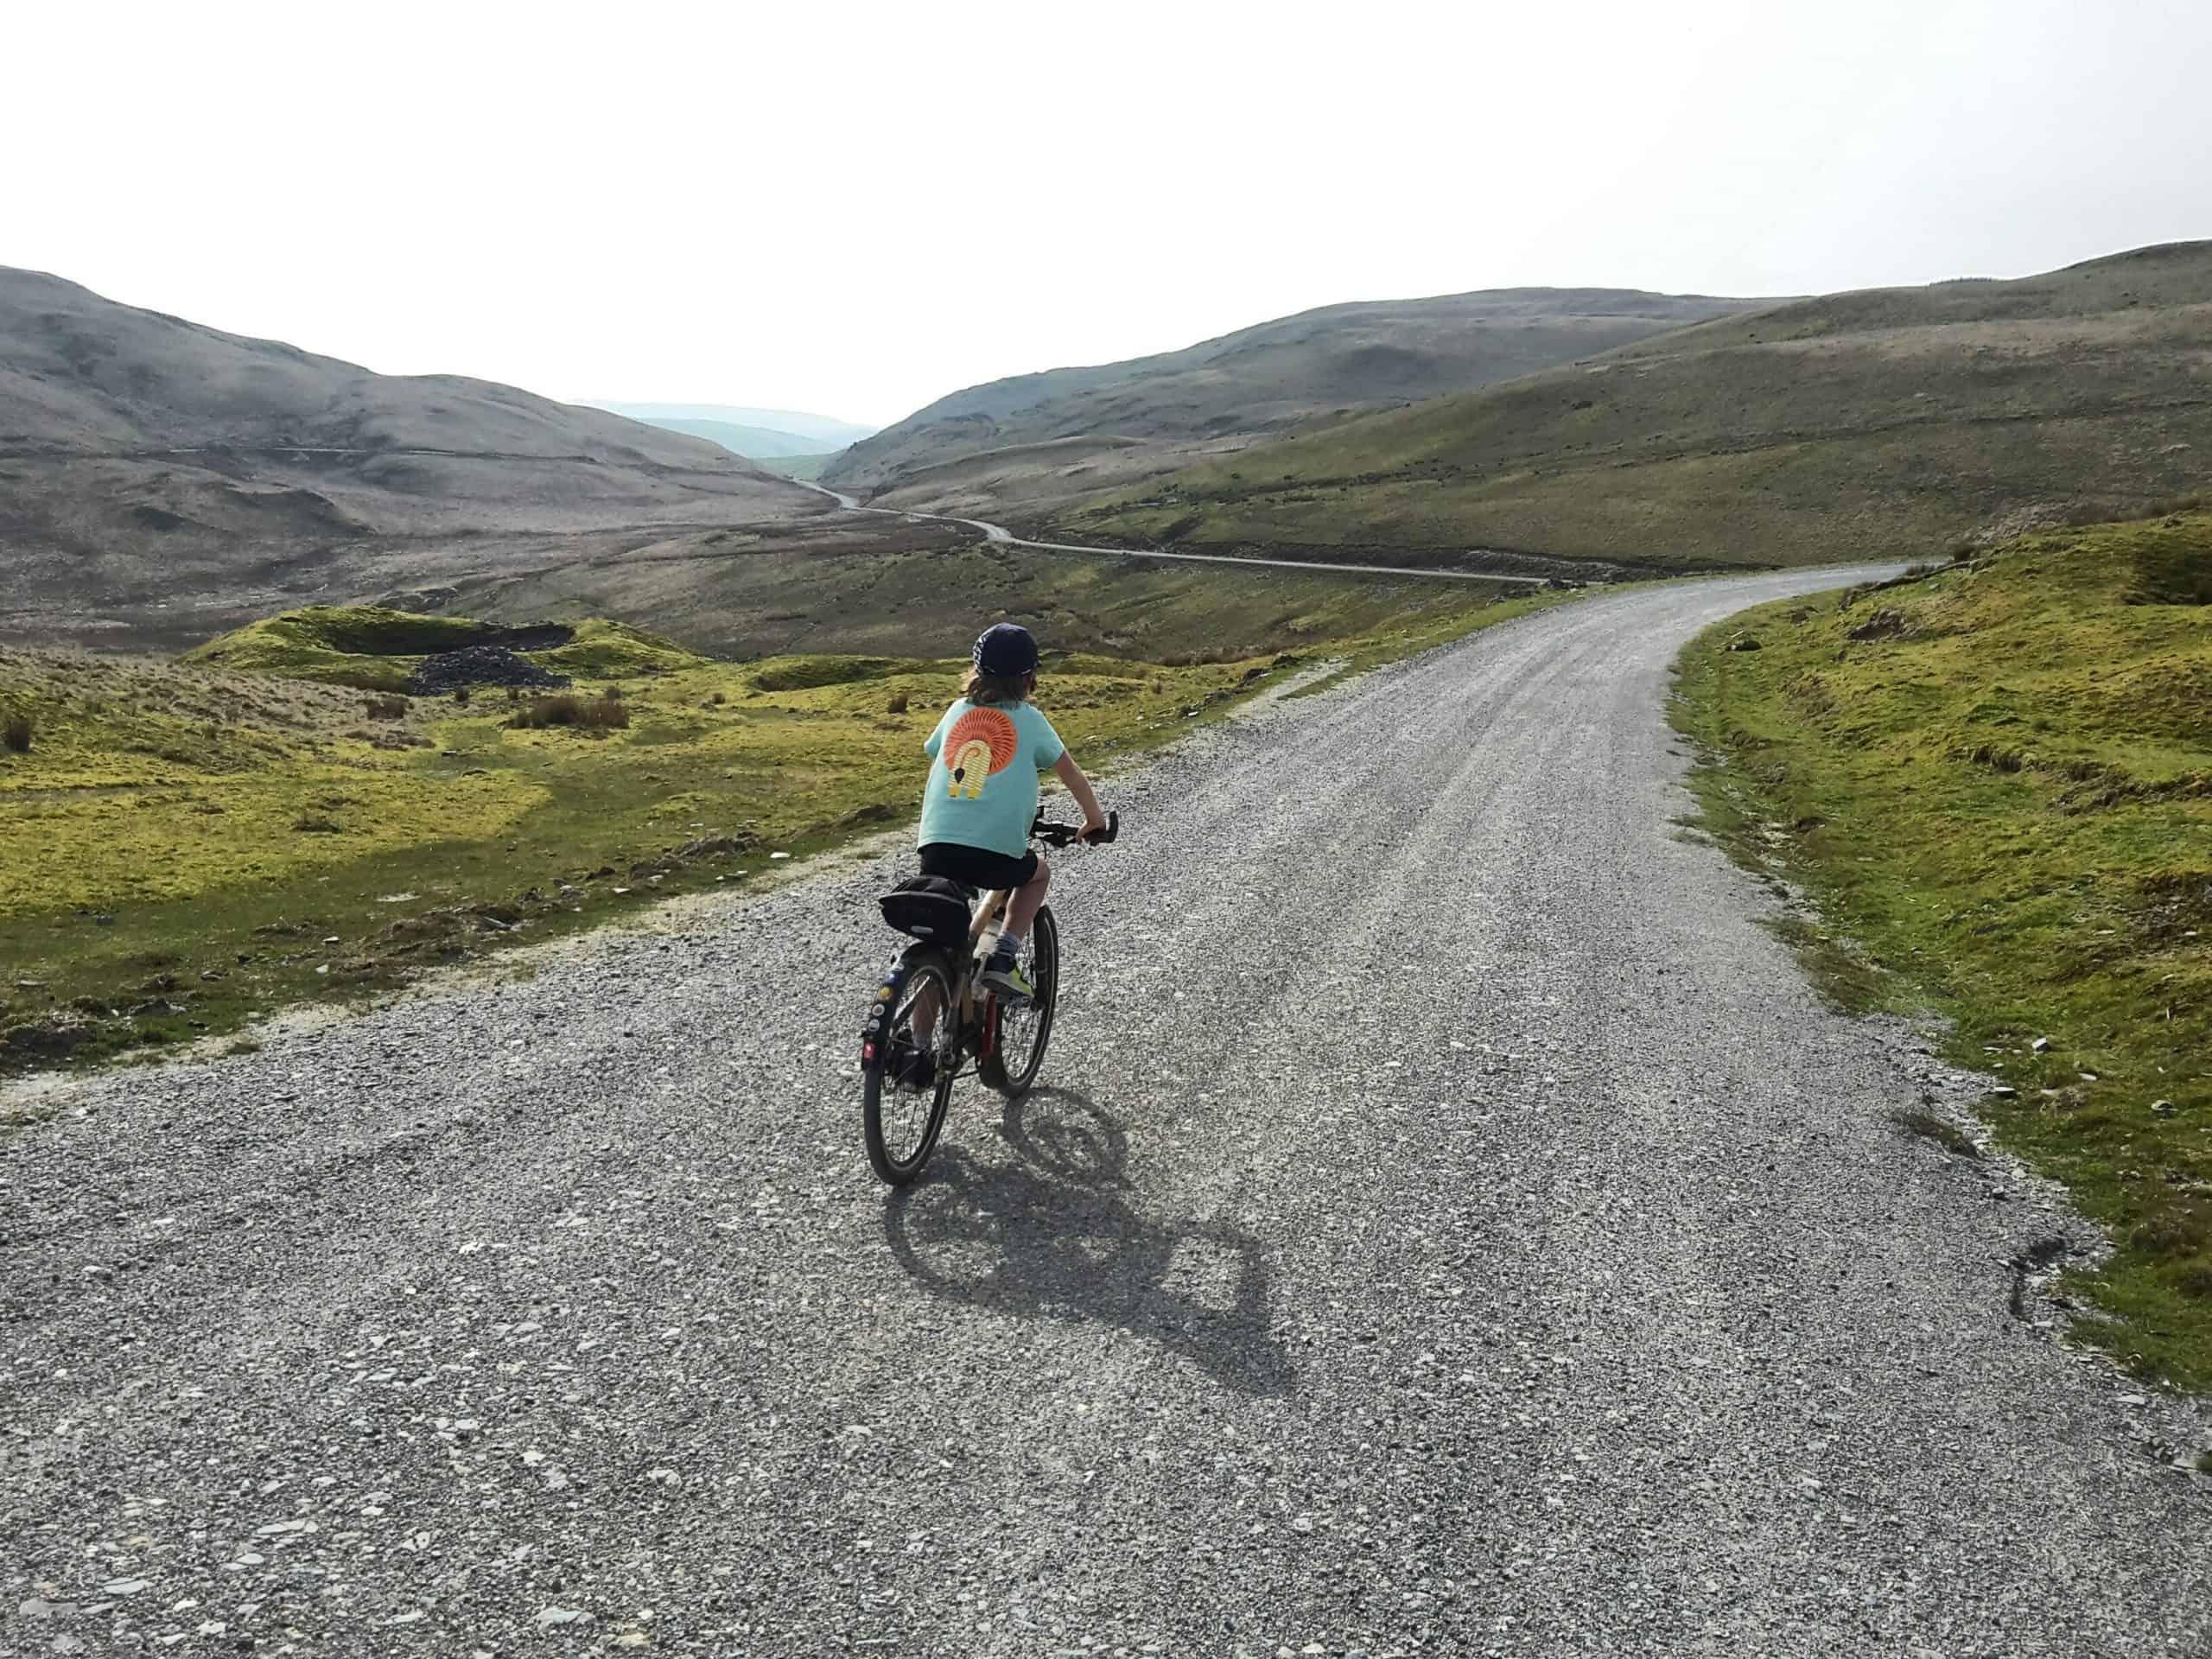 Snowdonia: Climbing Up, Riding Back 103